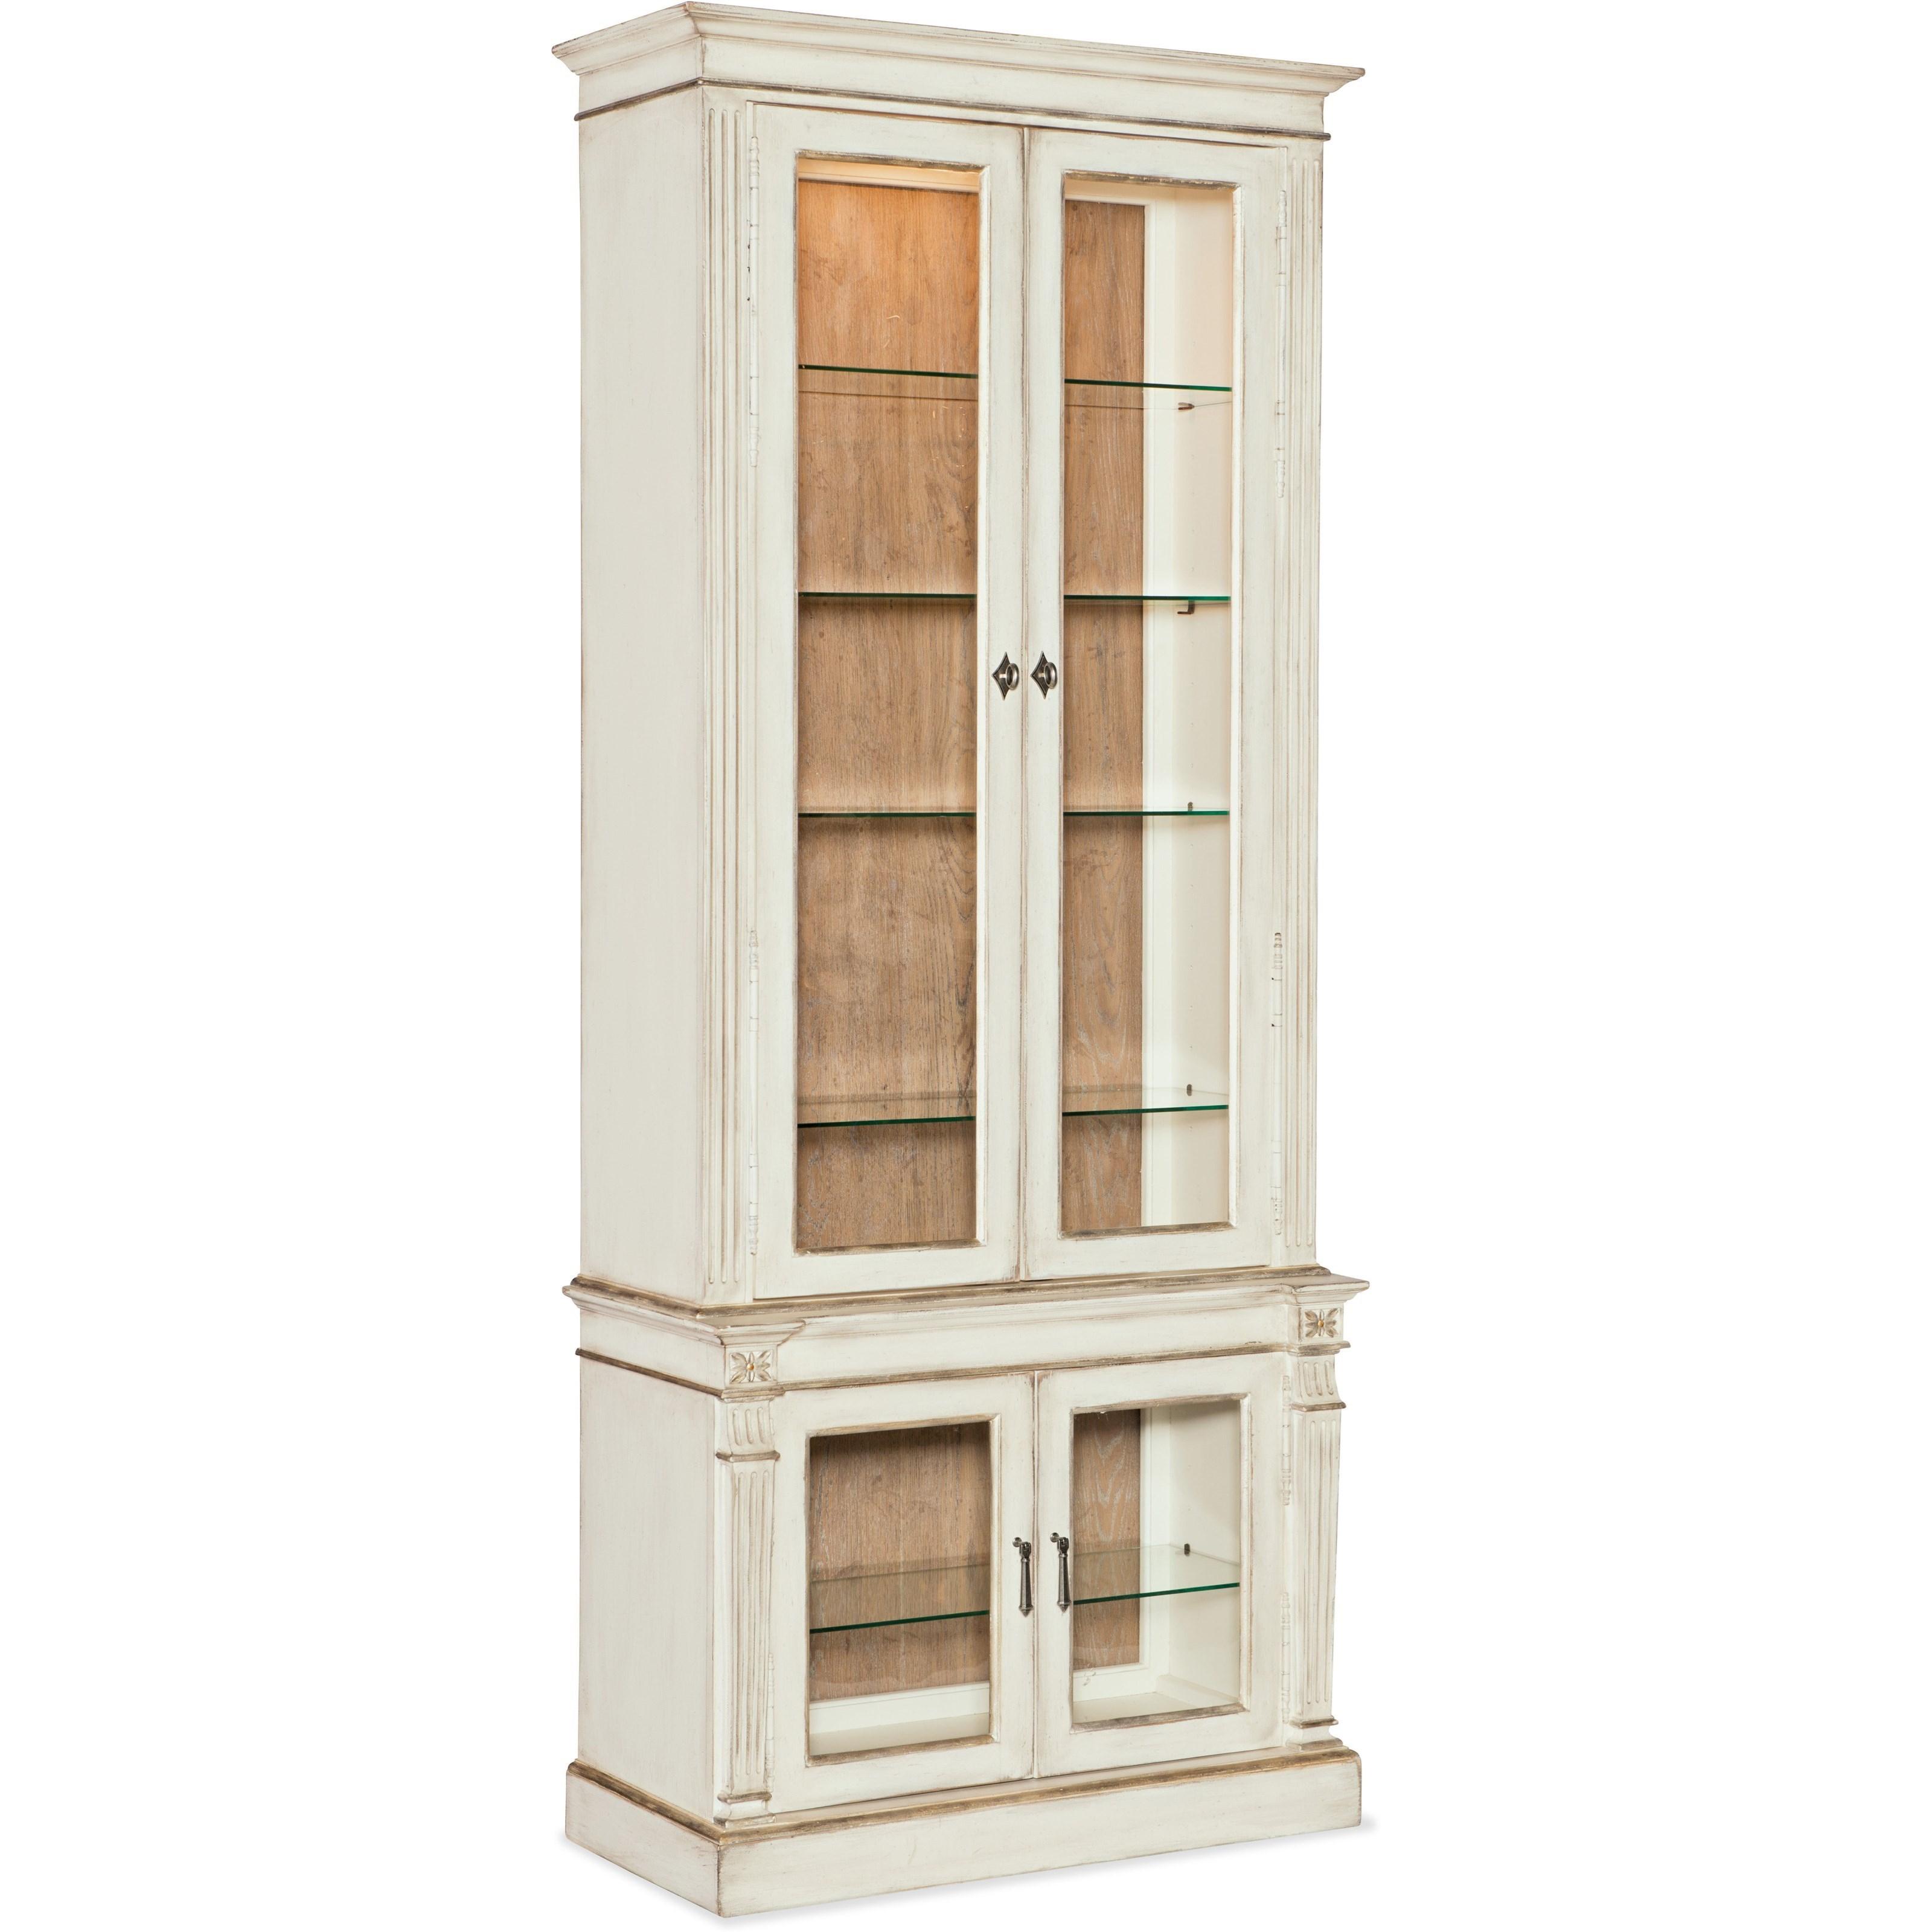 Sanctuary Display Cabinet by Hooker Furniture at Baer's Furniture